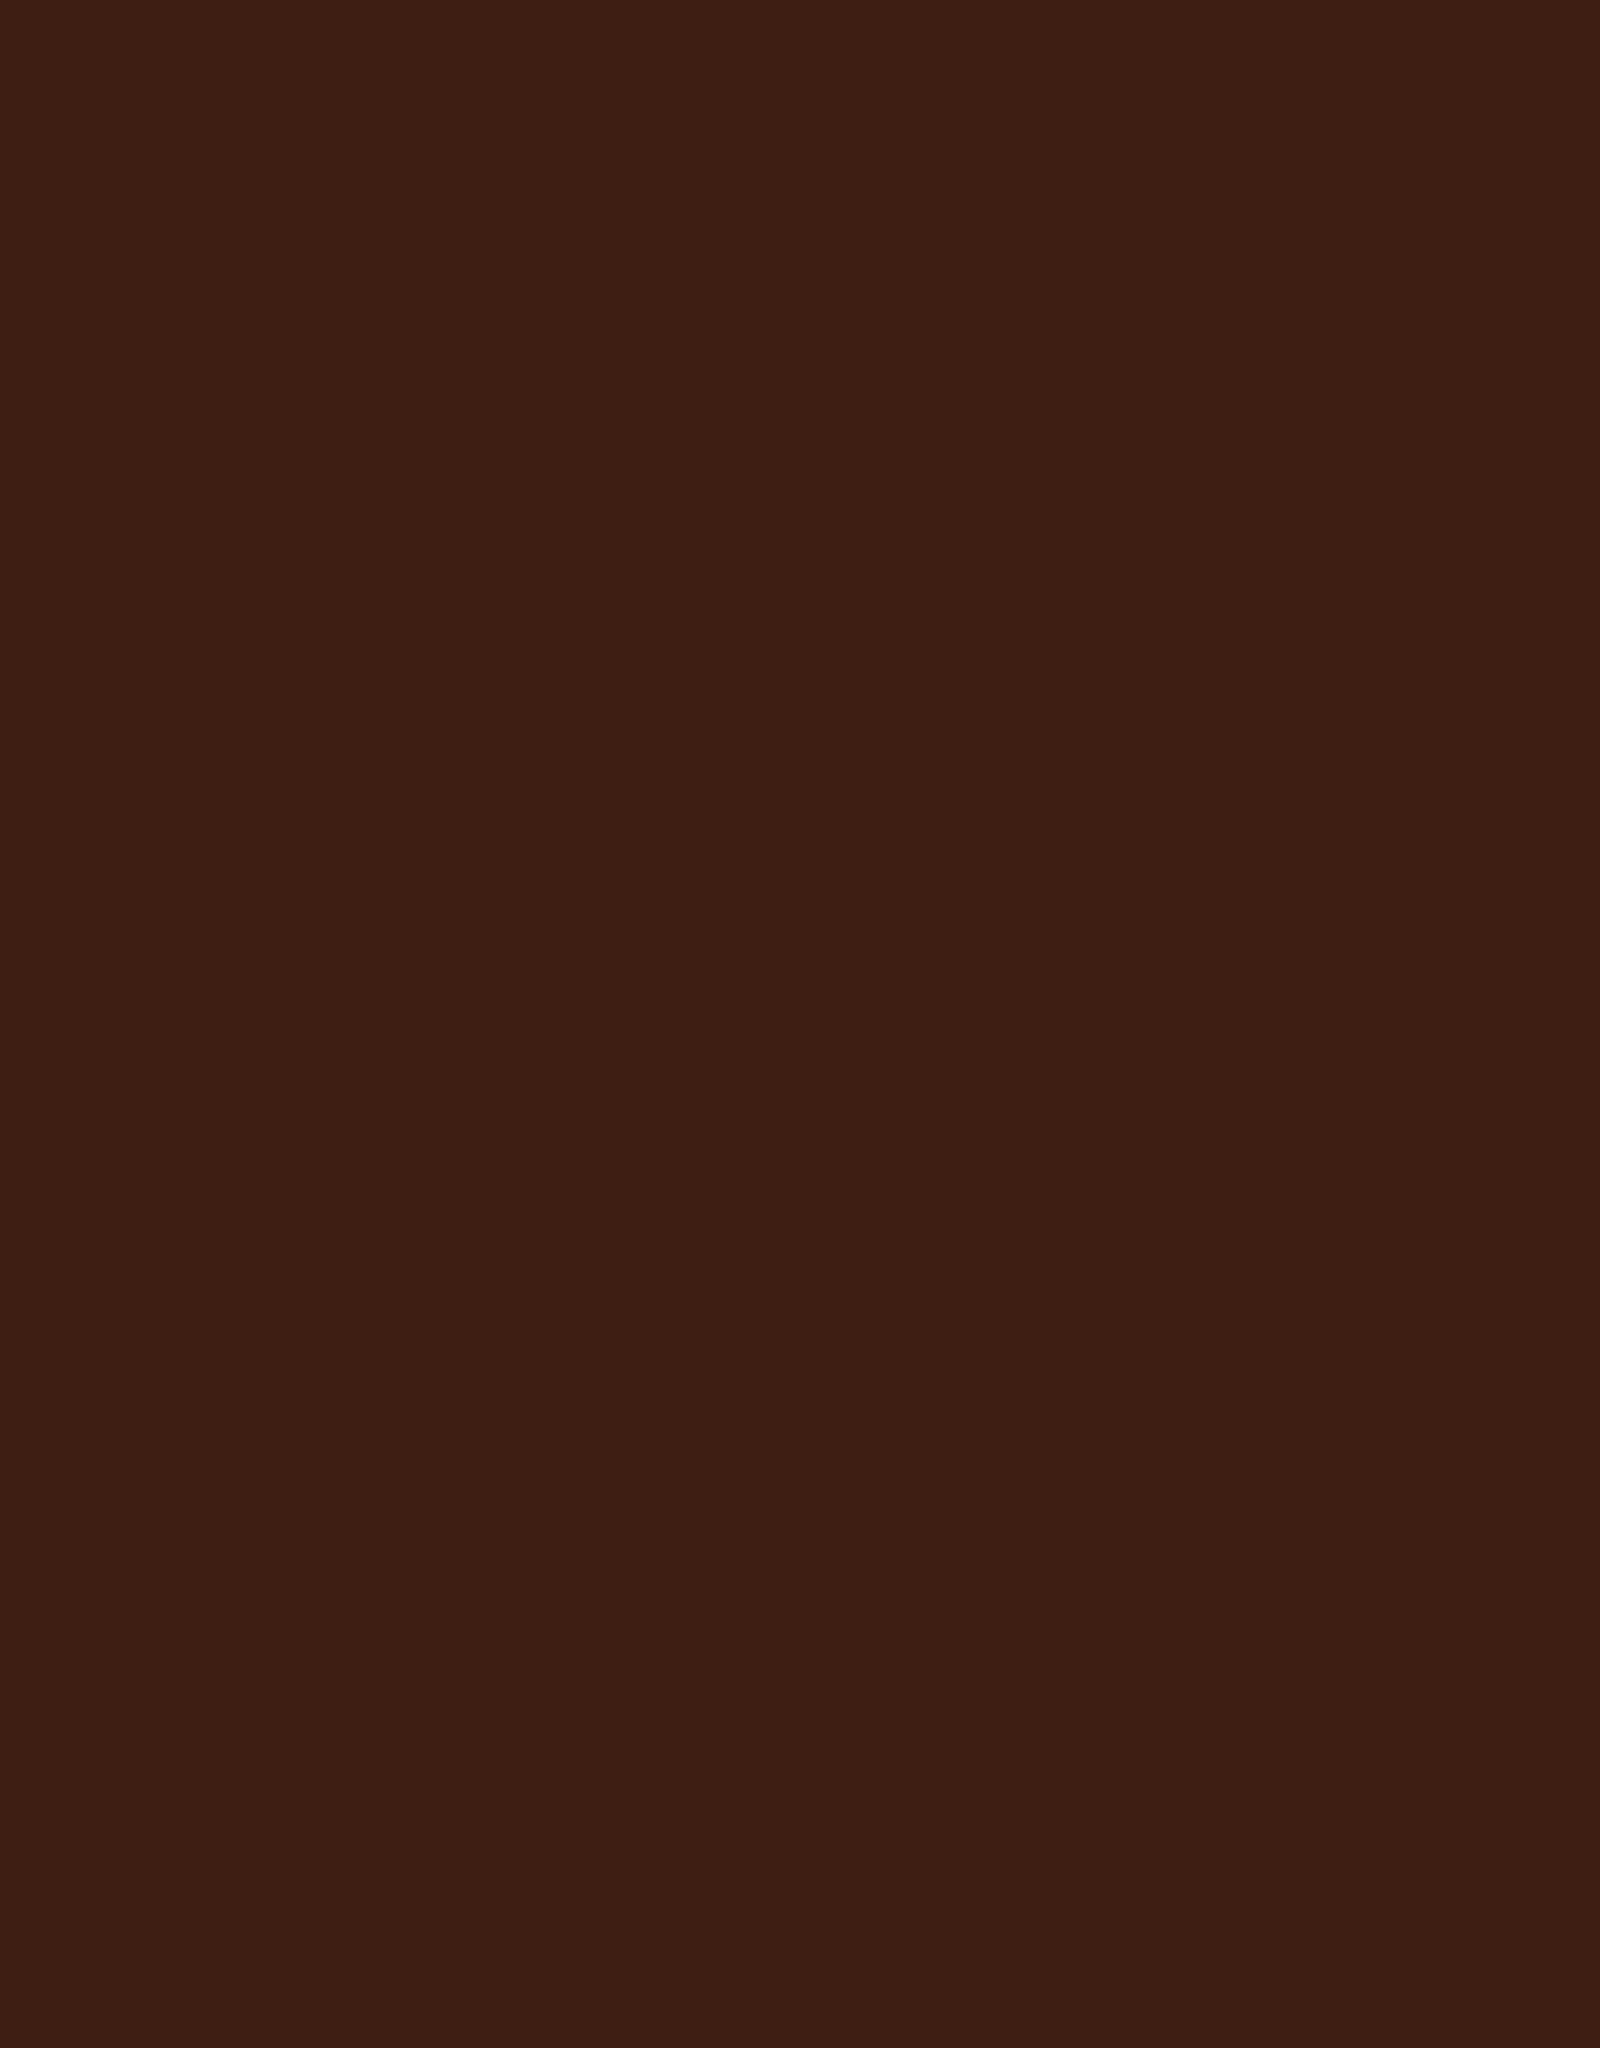 Trapsuutjies Chocola